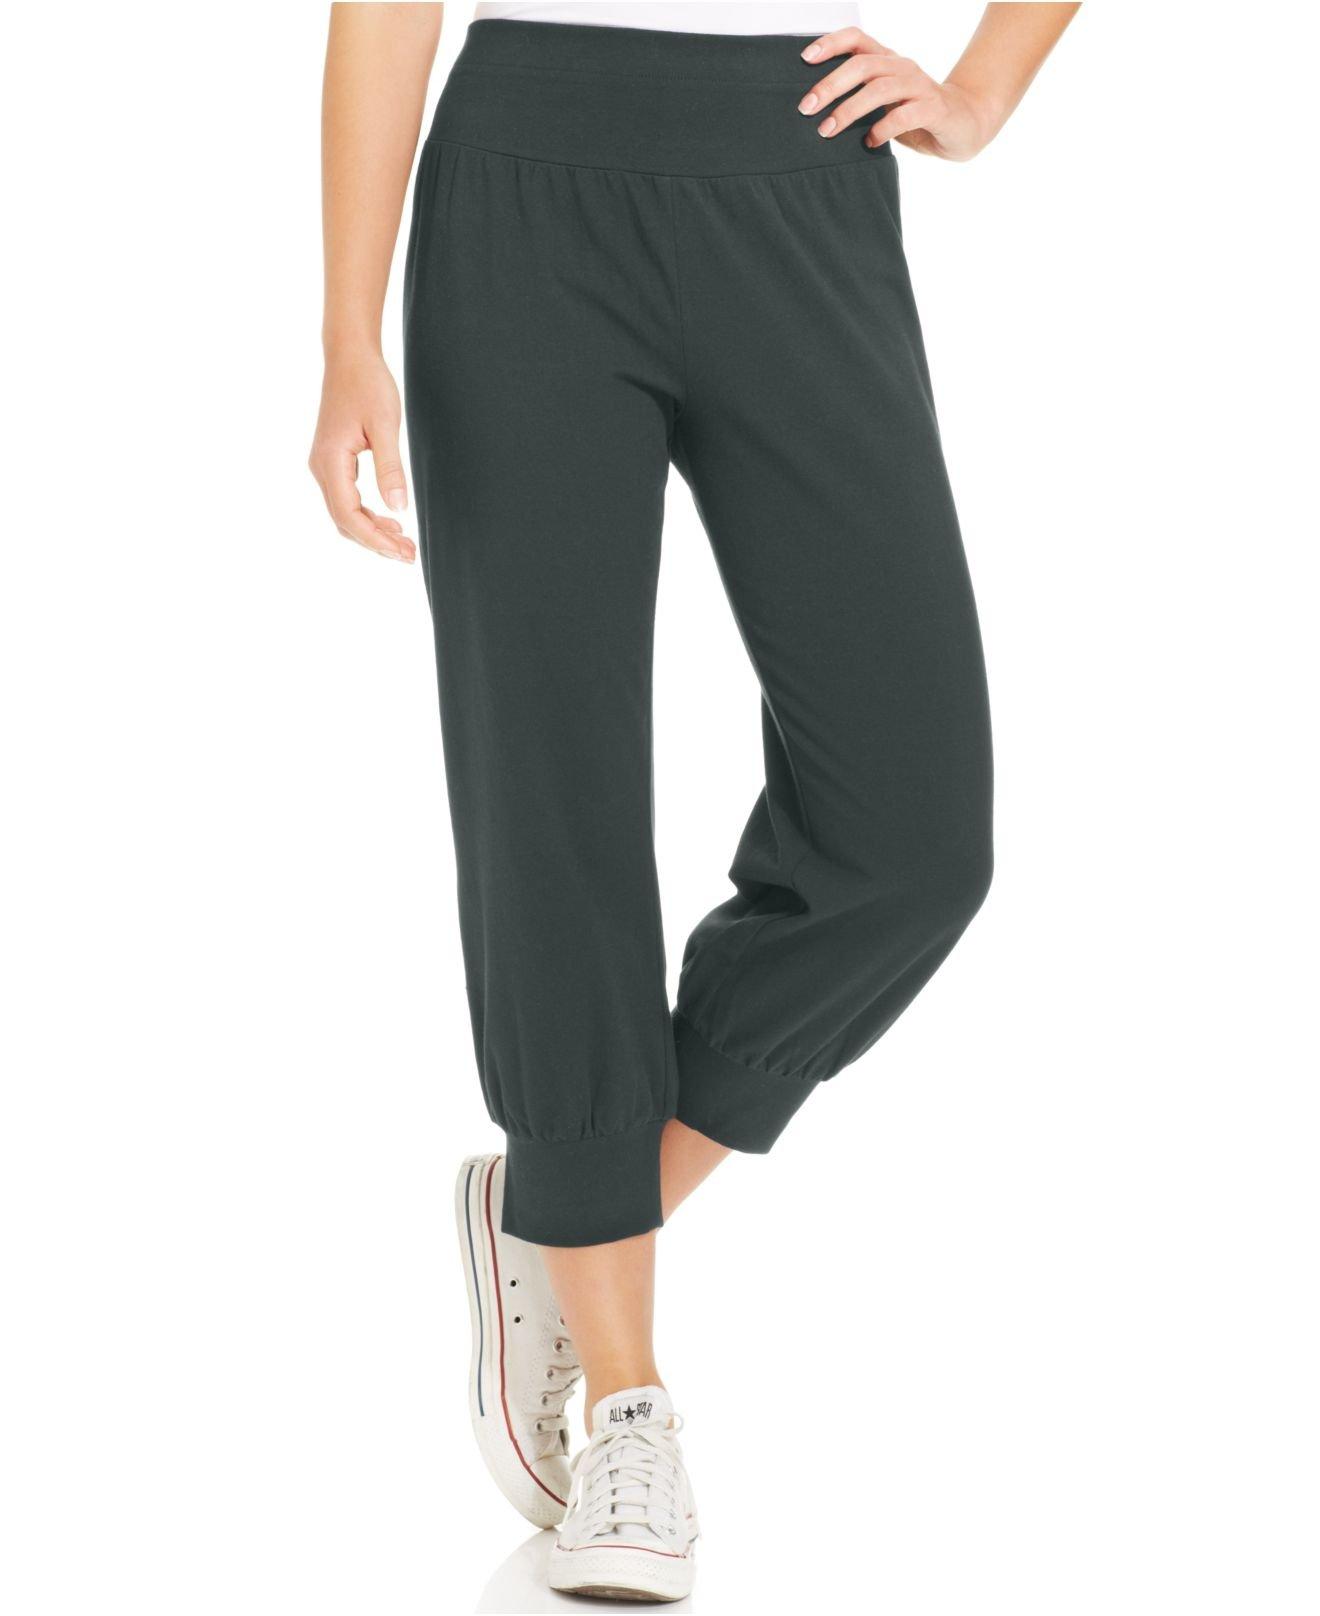 Style & co. Petite Knit Jogger Capri Pants in Gray | Lyst